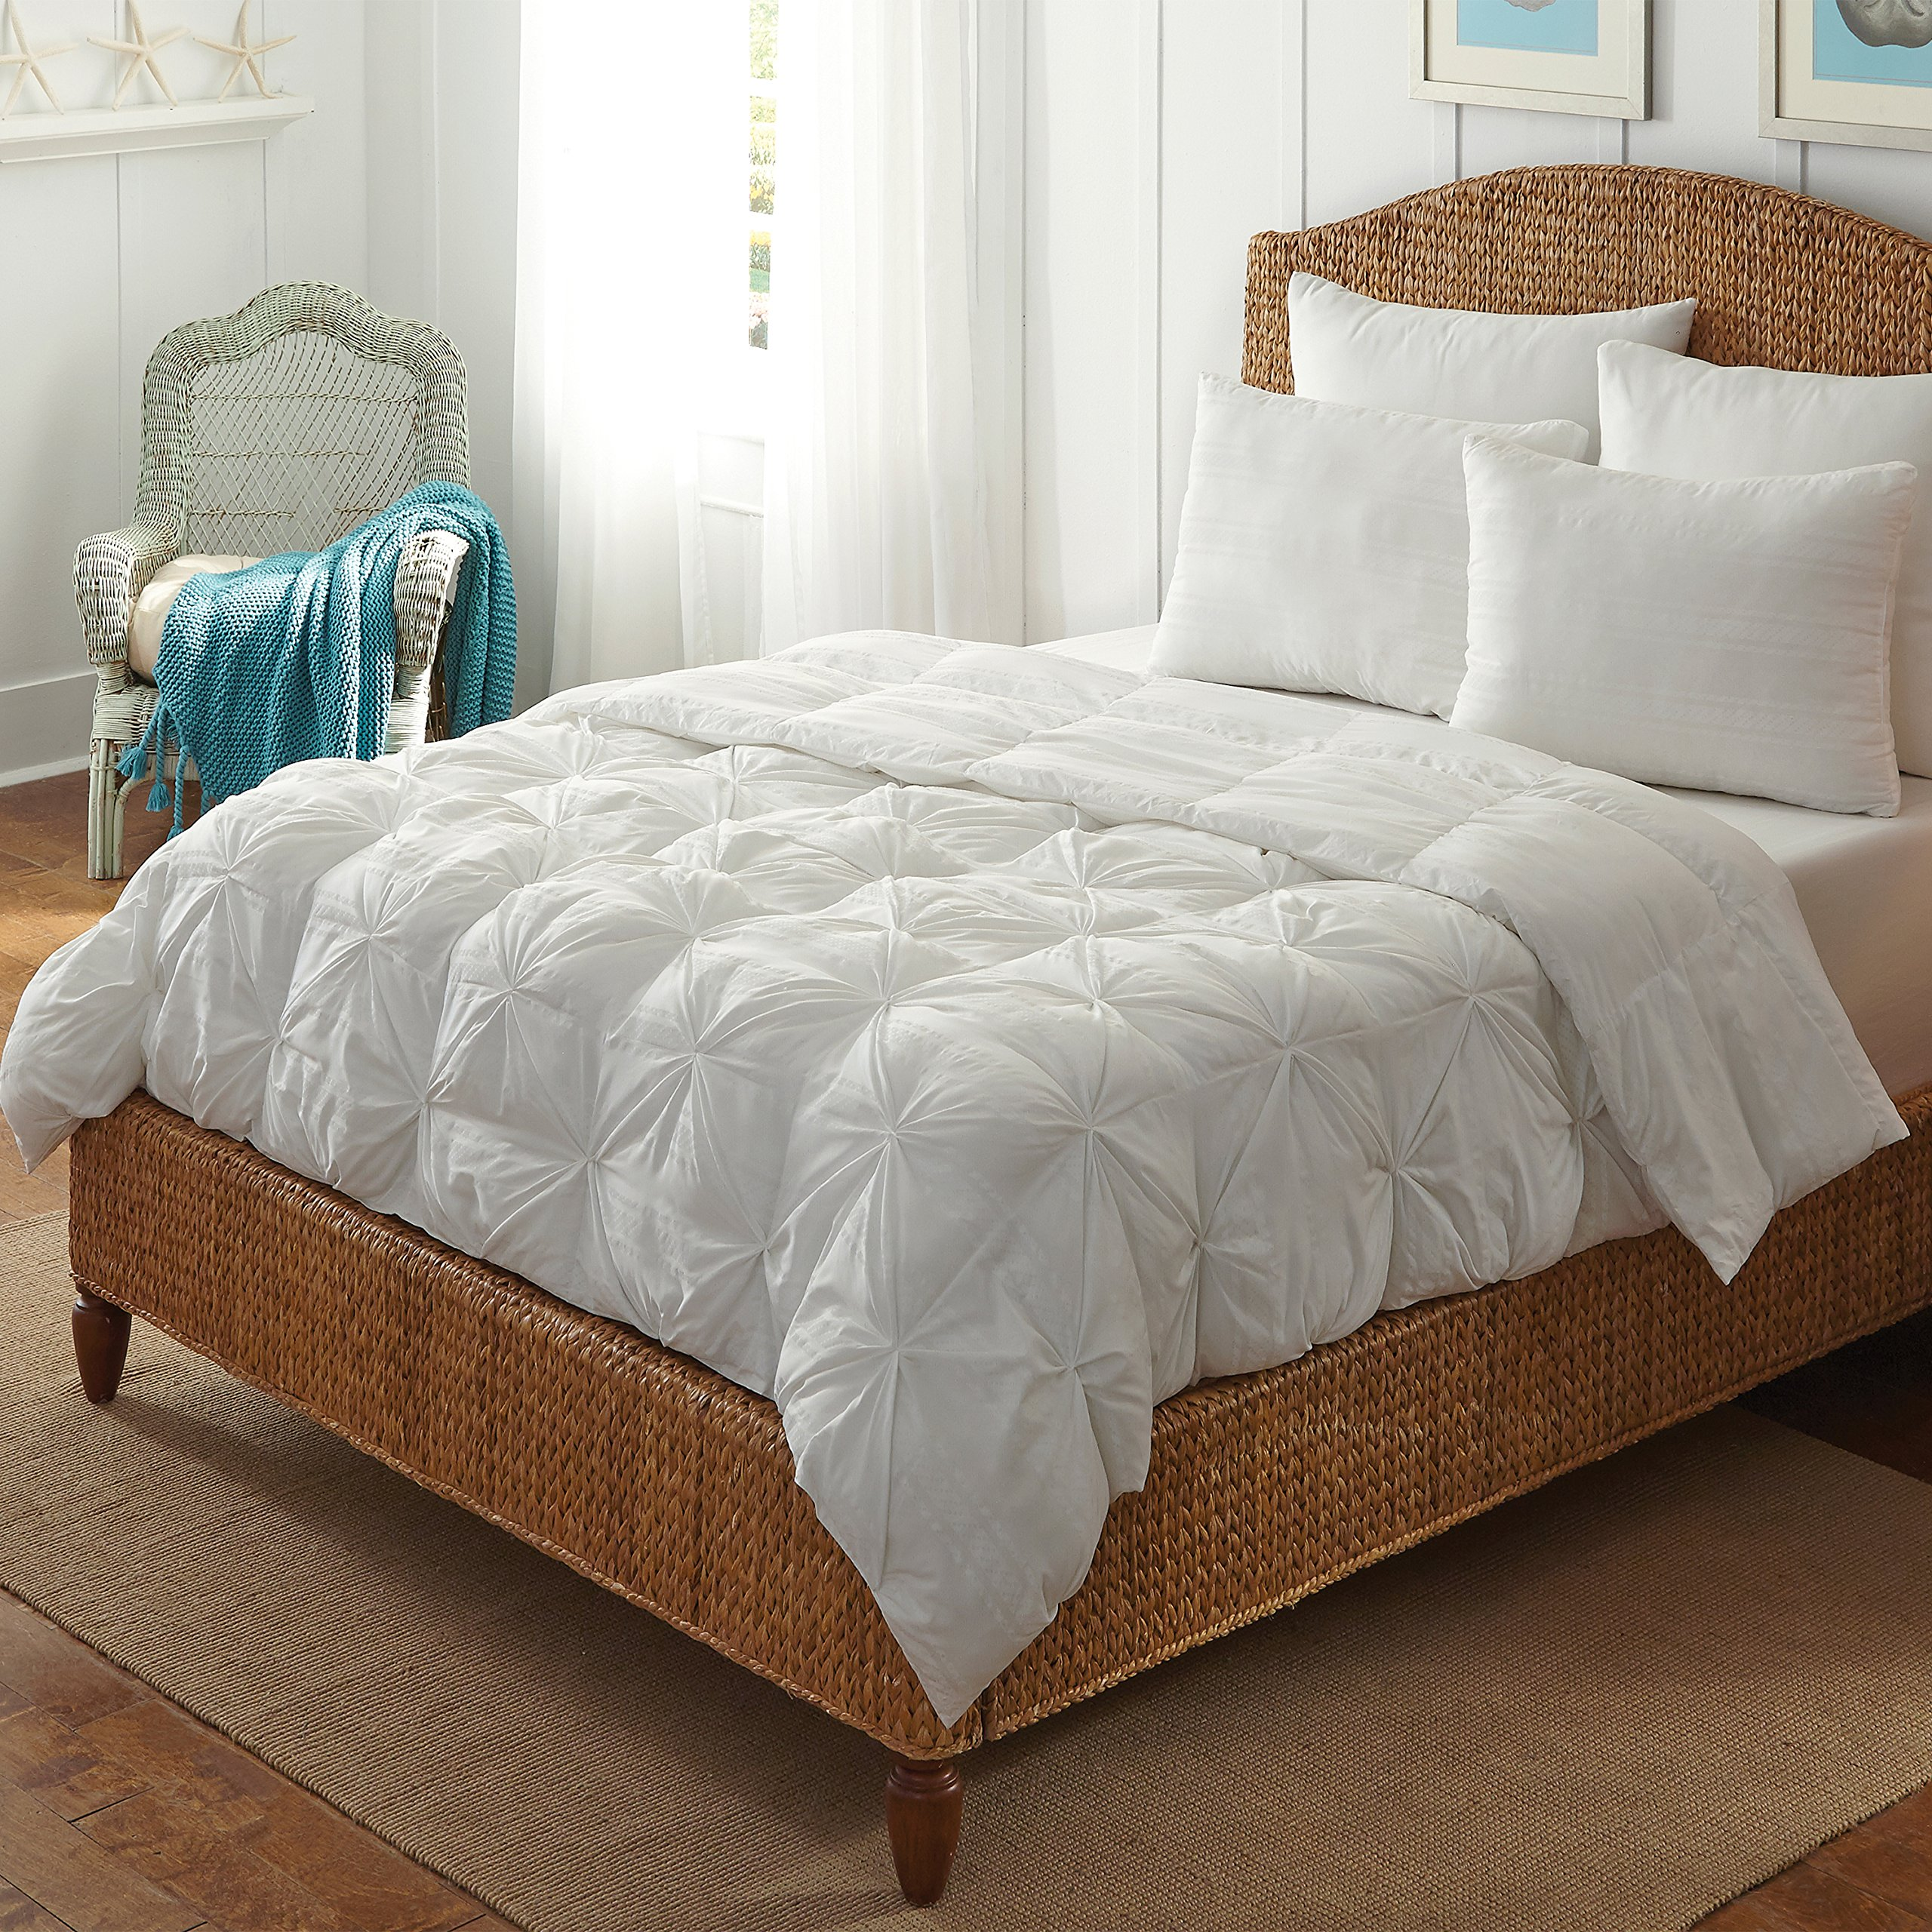 Hotel Laundry CF-023-1T All Season Goose Down Alternative Comforter Hotel Pin Tuck Style